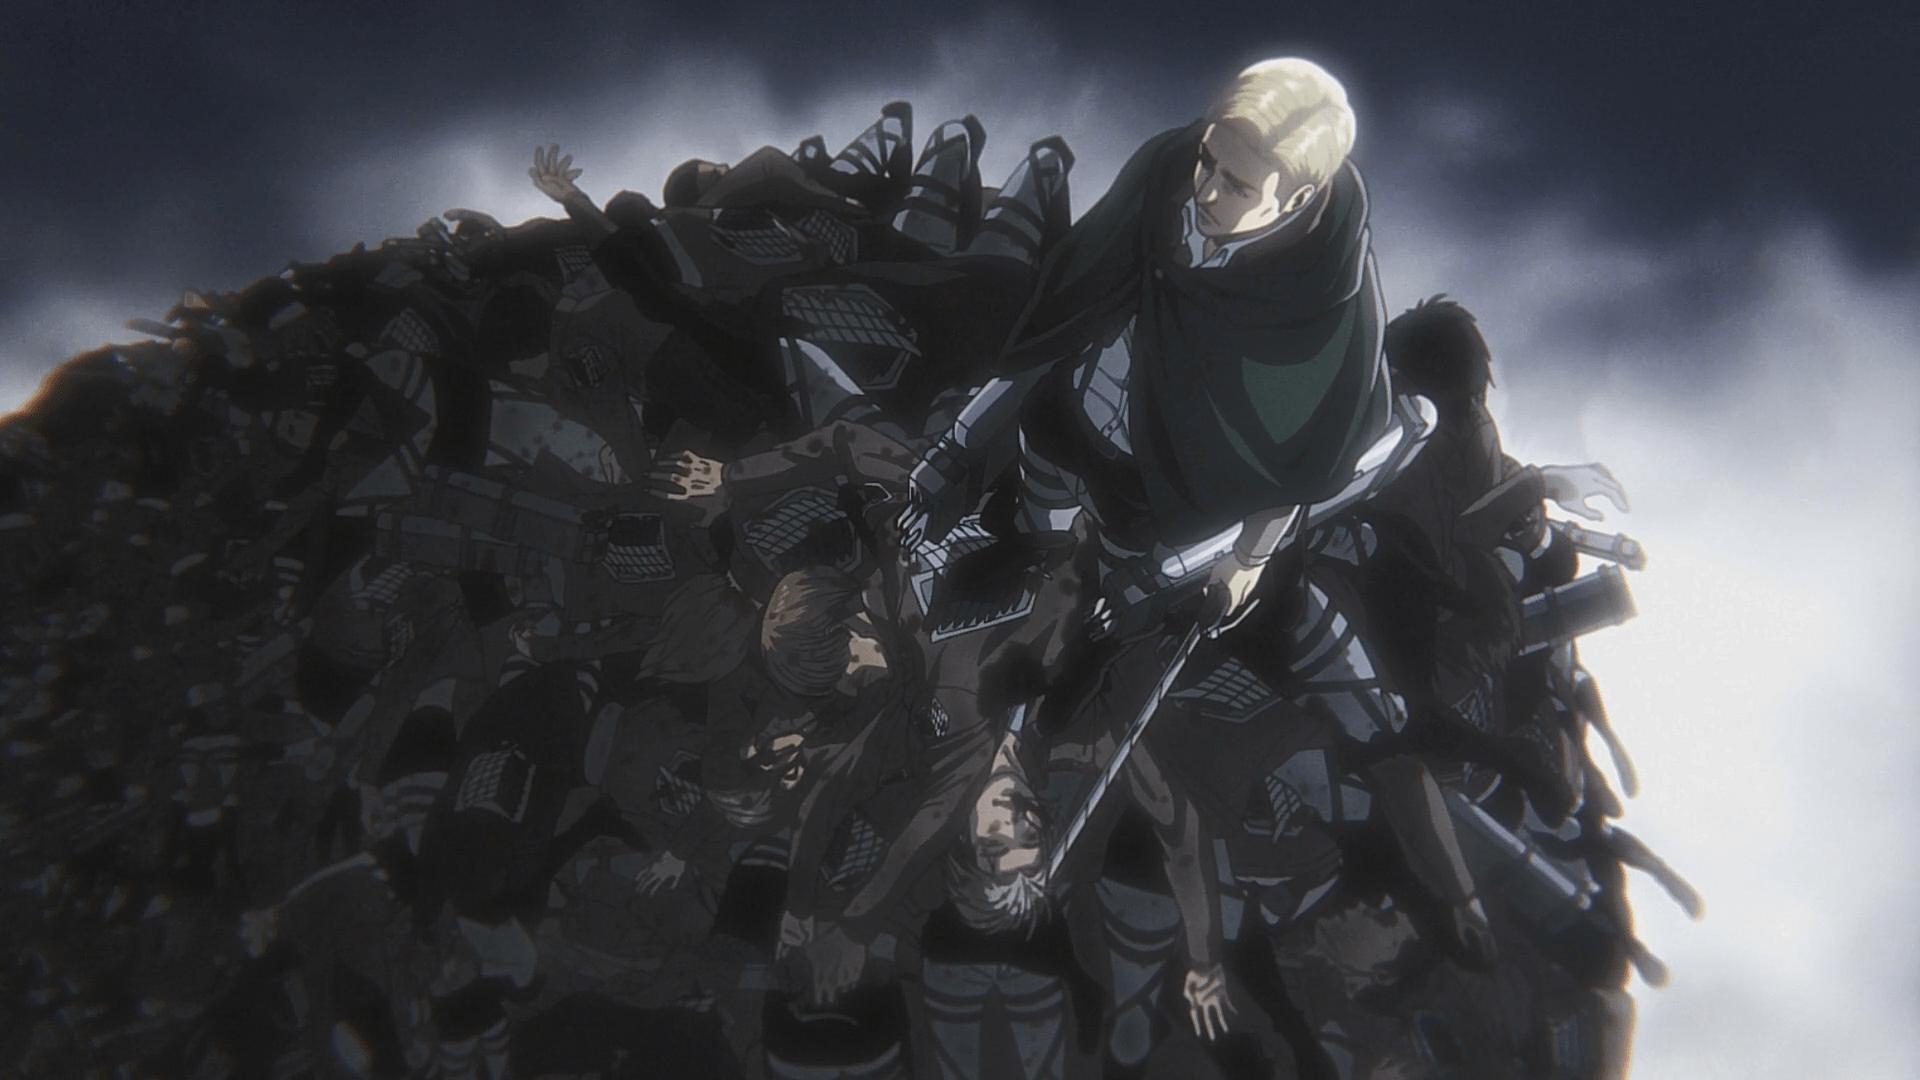 Blog Anime Wallpaper Attack On Titan Season 3 Shingeki Wallpaper